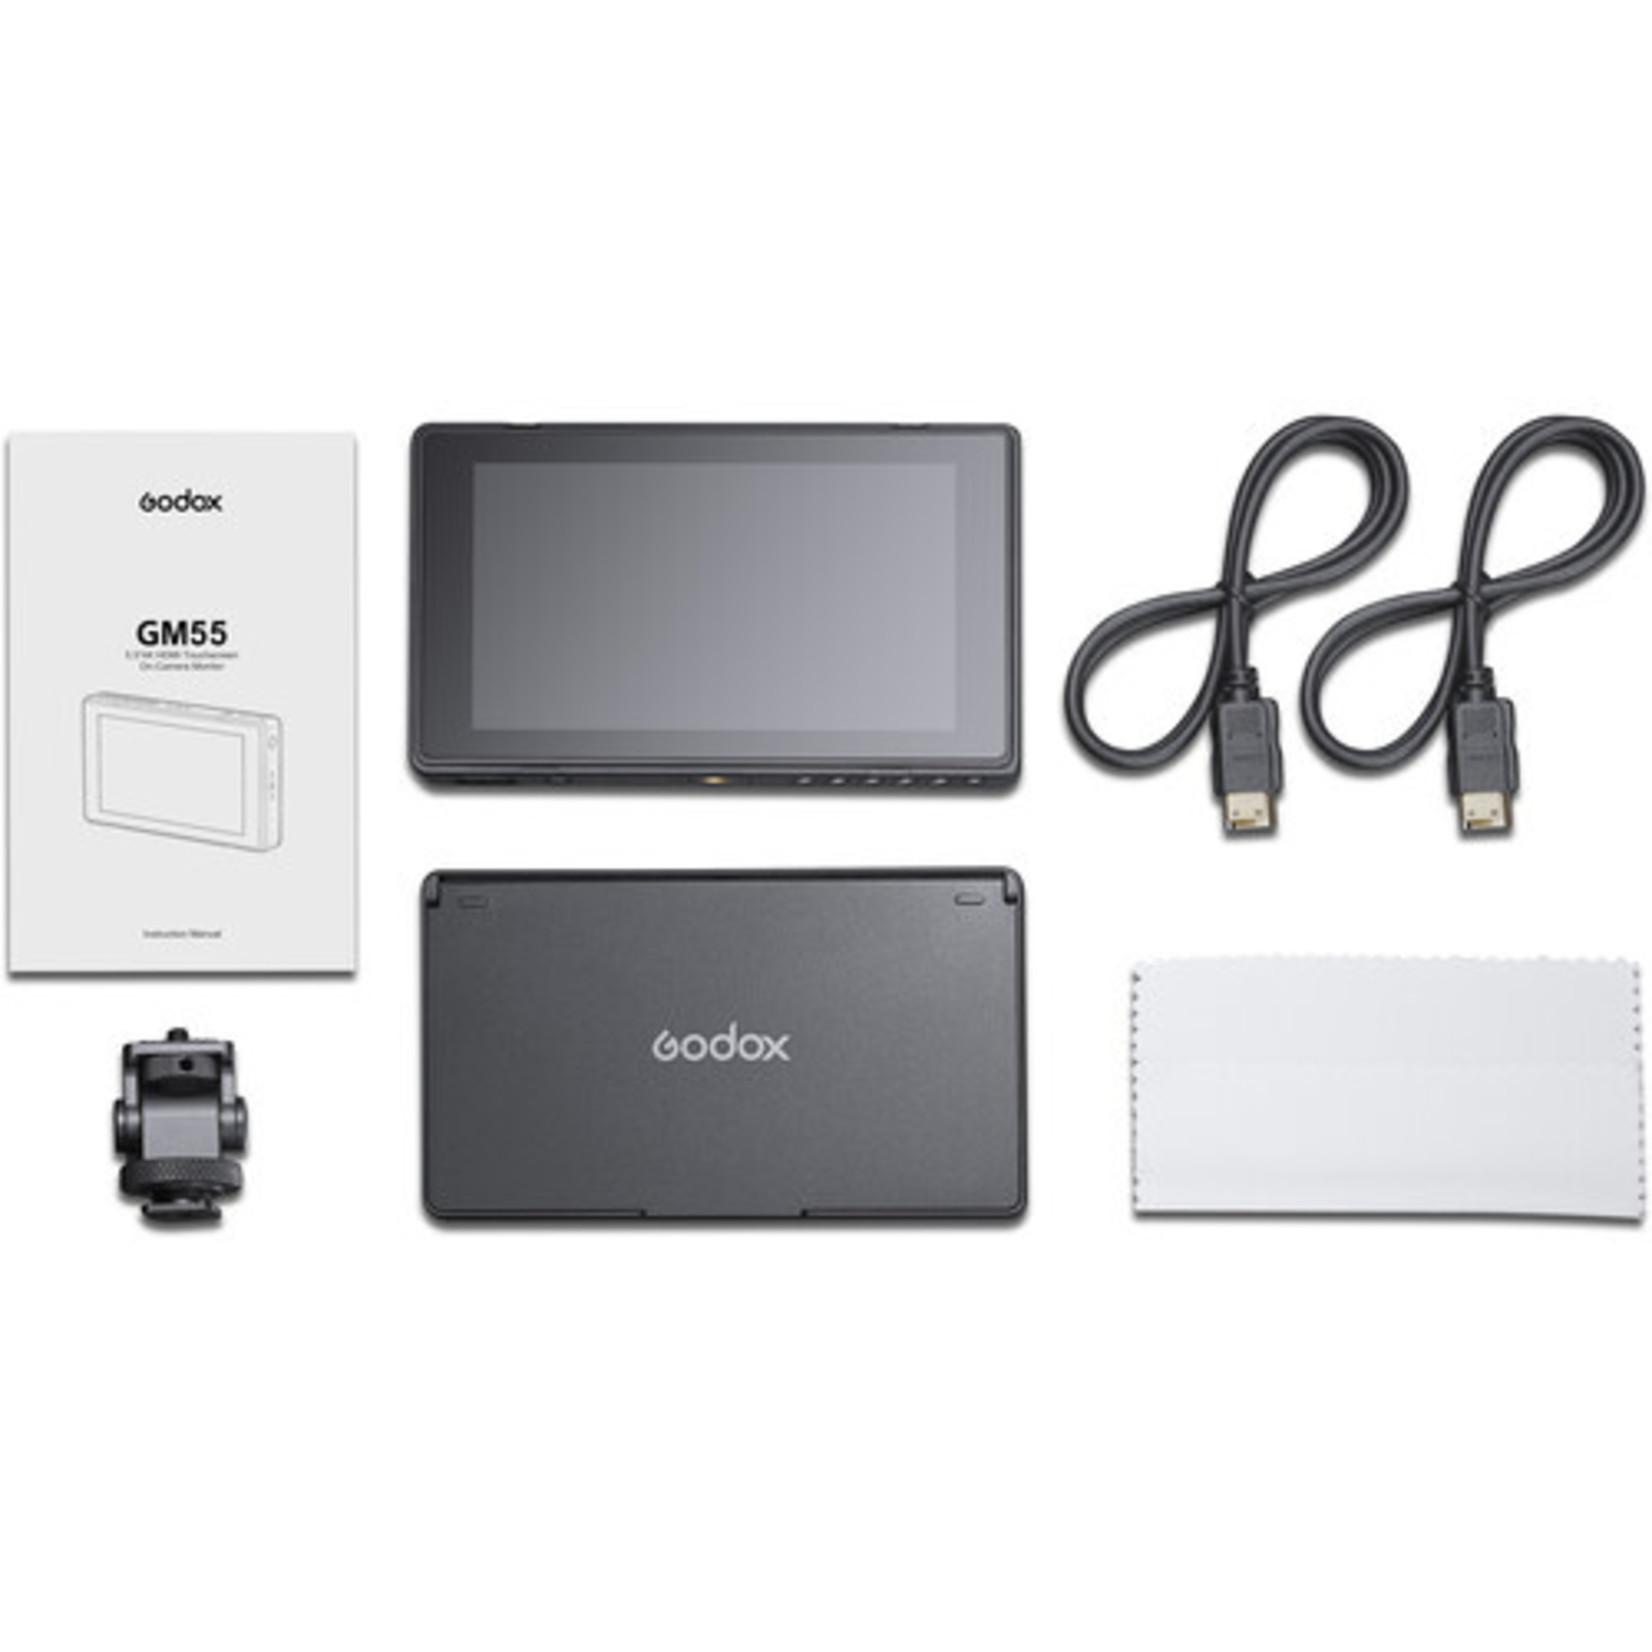 "Godox Godox 5.5"" 4K HDMI Touchscreen On-Camera Monitor"